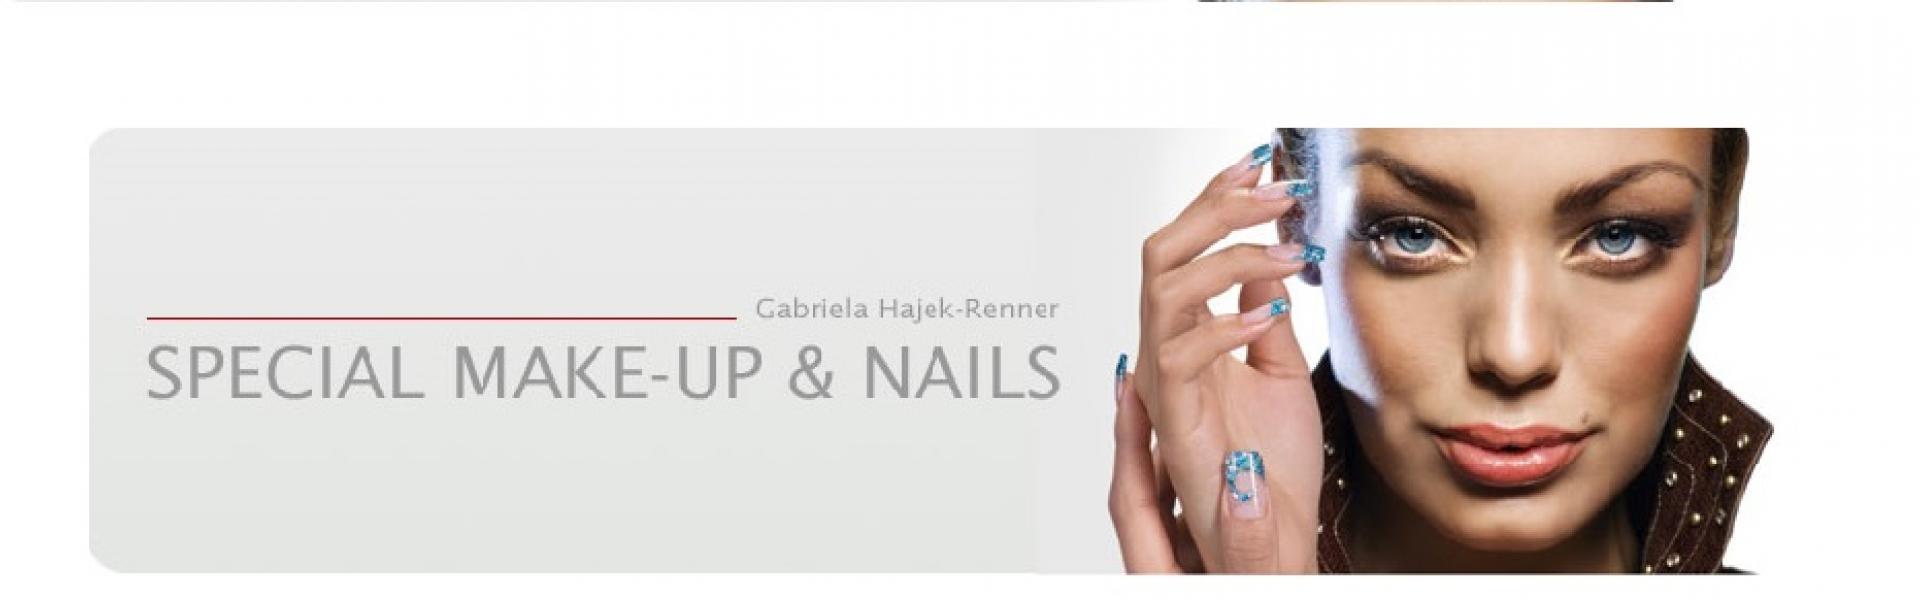 Make-Up Studio Hajek-Renner cover